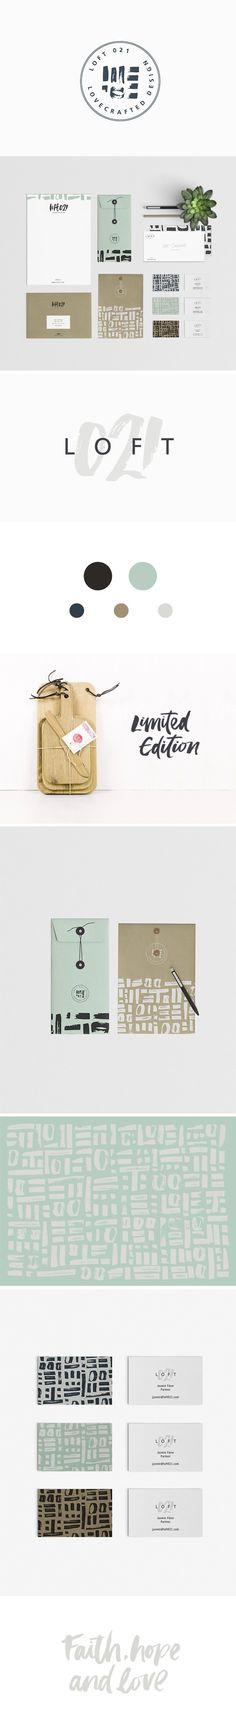 Design | Cocorrina | Page 2